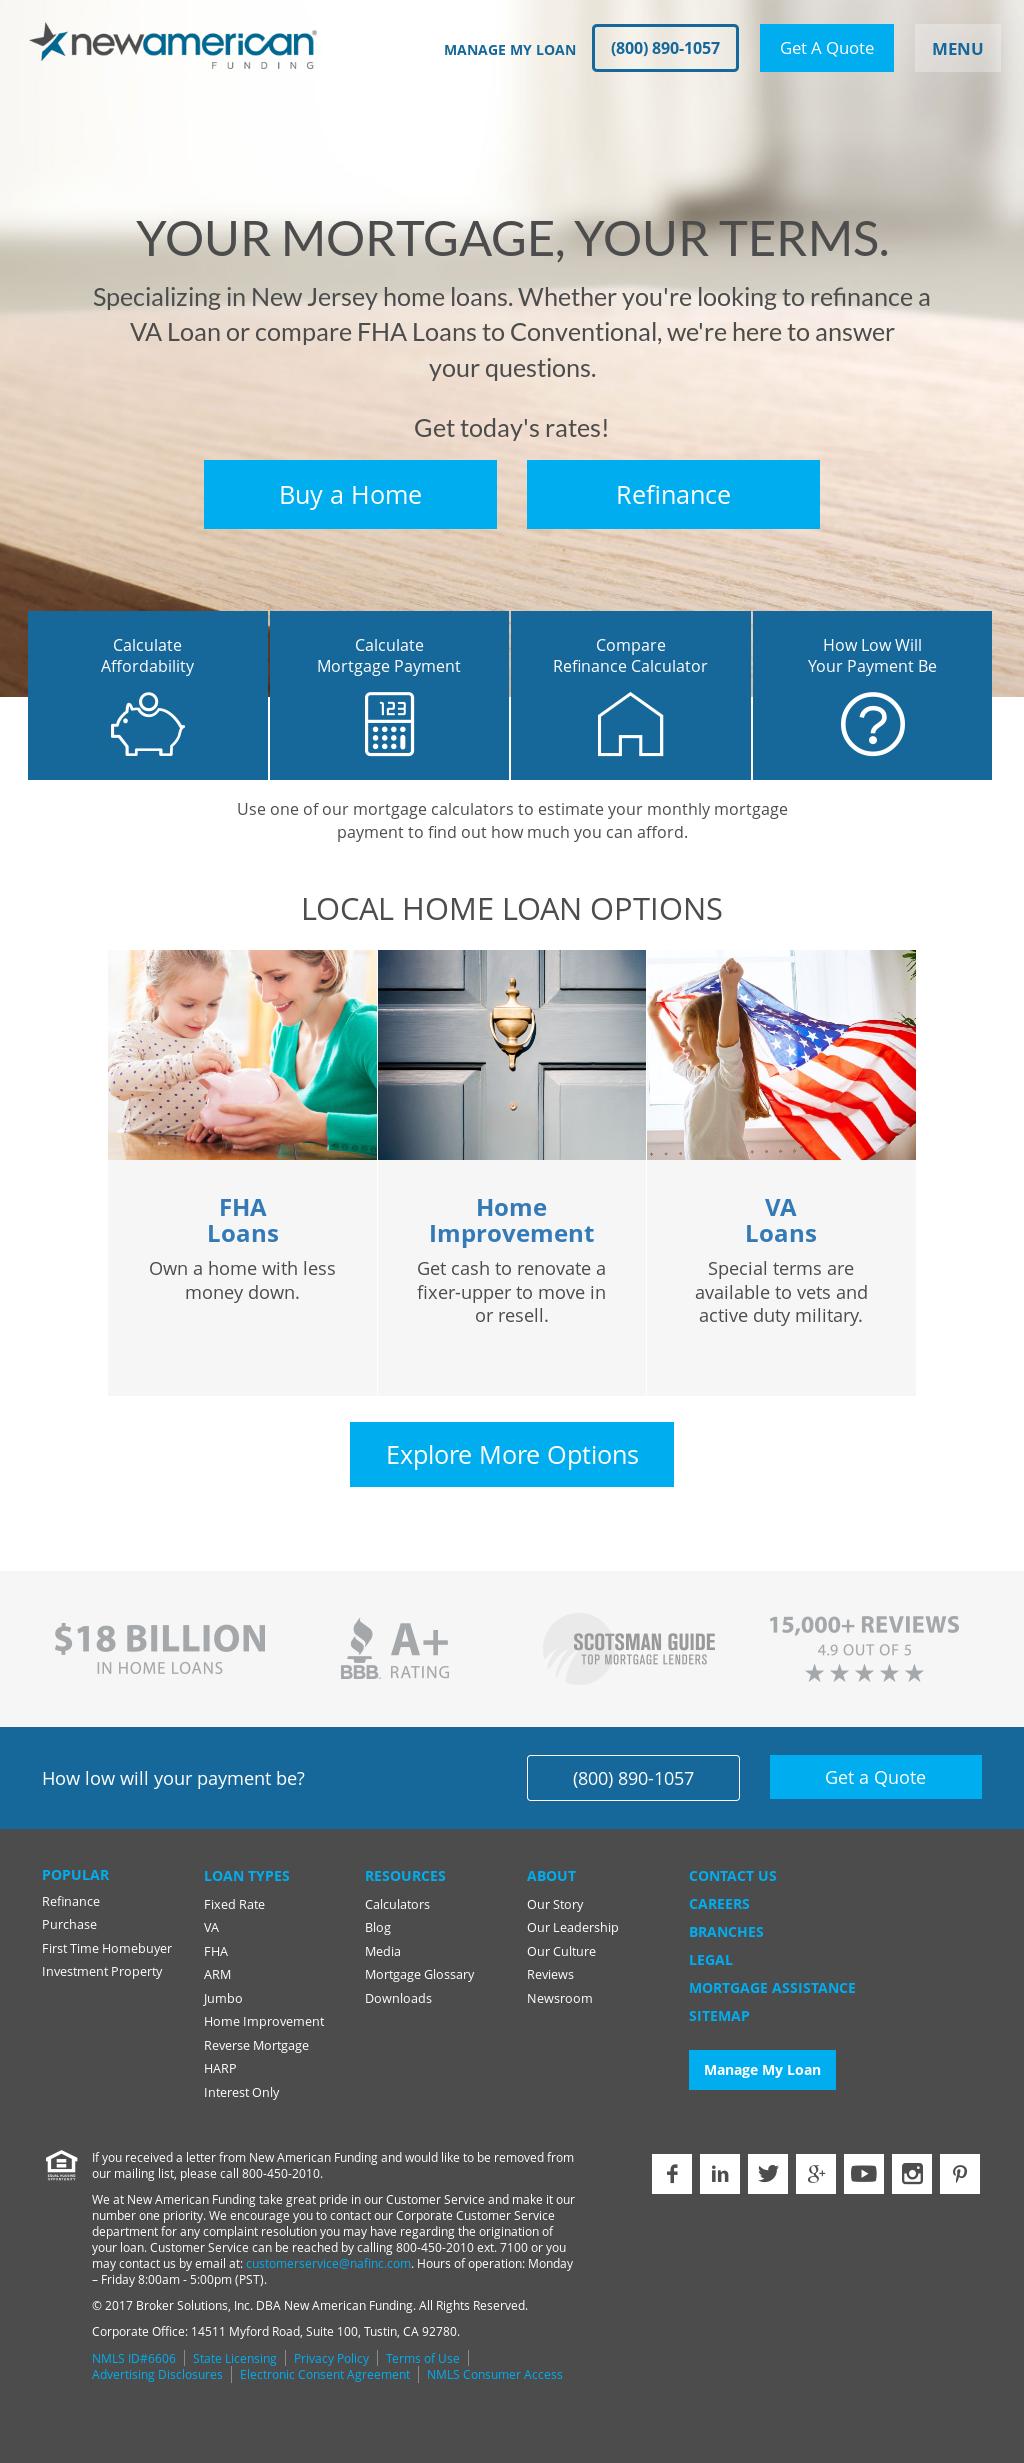 new american funding website history